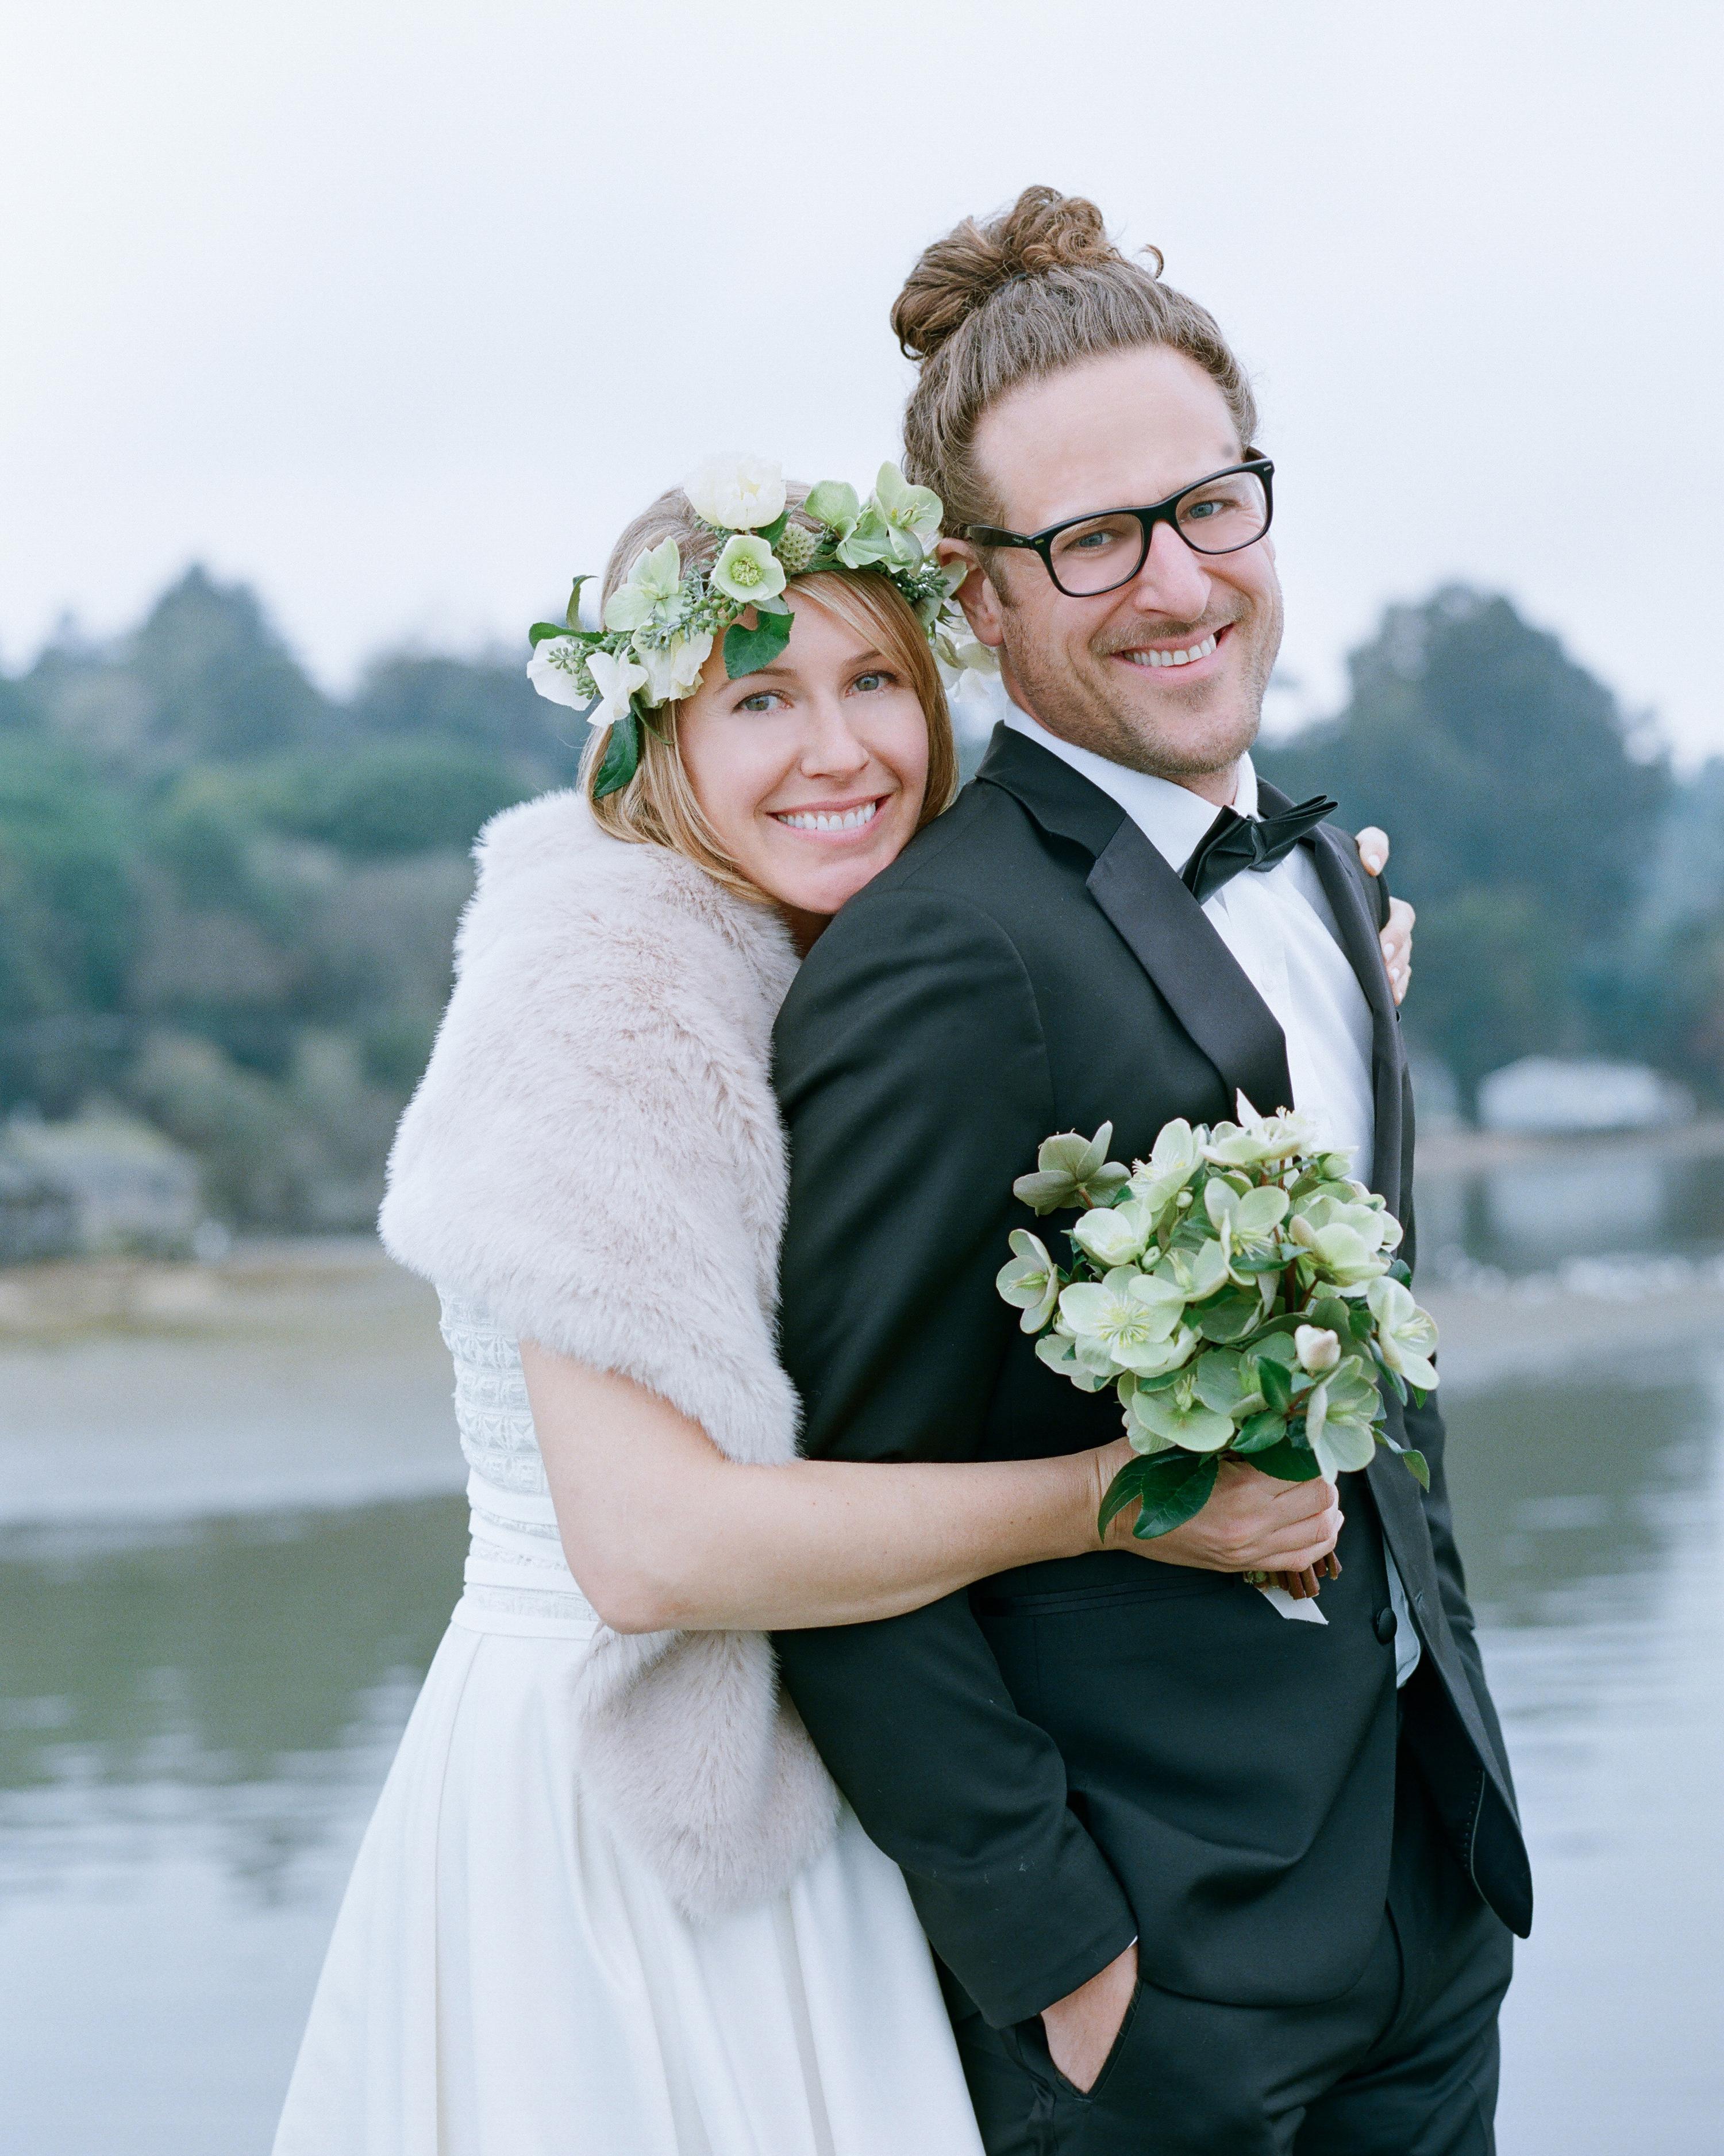 alison-markus-wedding-305-ds111251.jpg